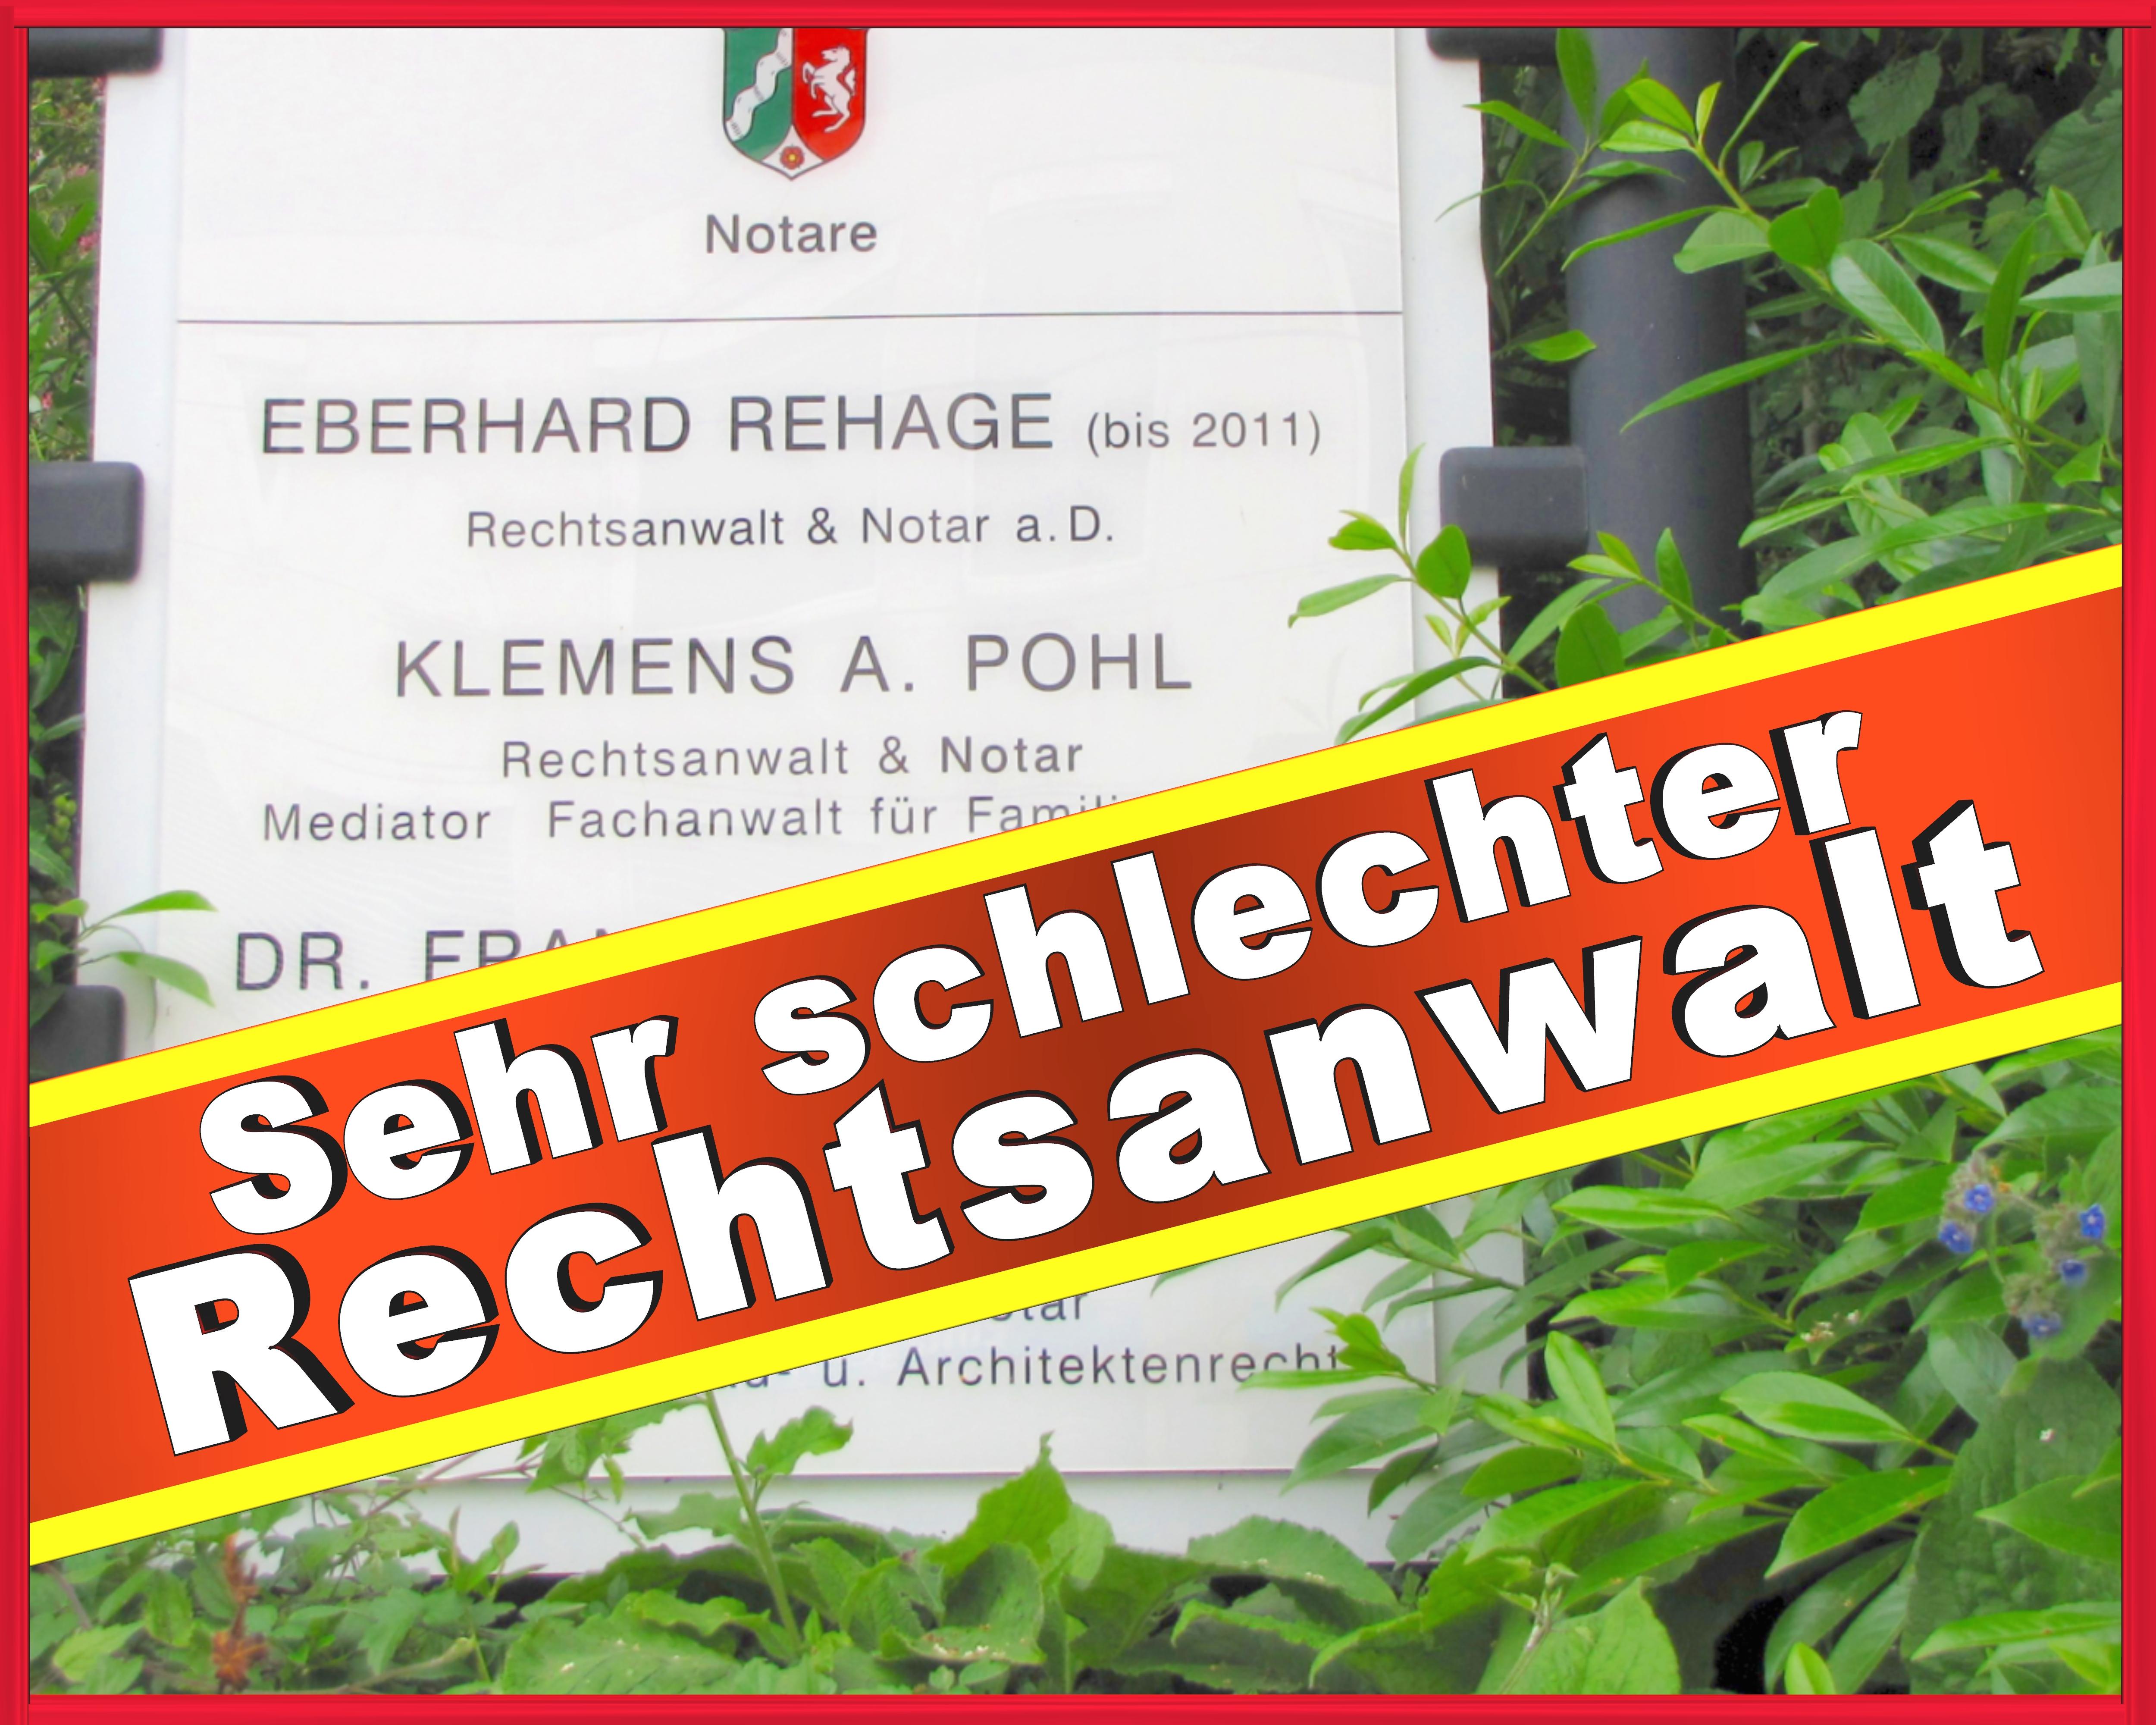 RECHTSANWALT KLEMENS POHL BIELEFELD (1)